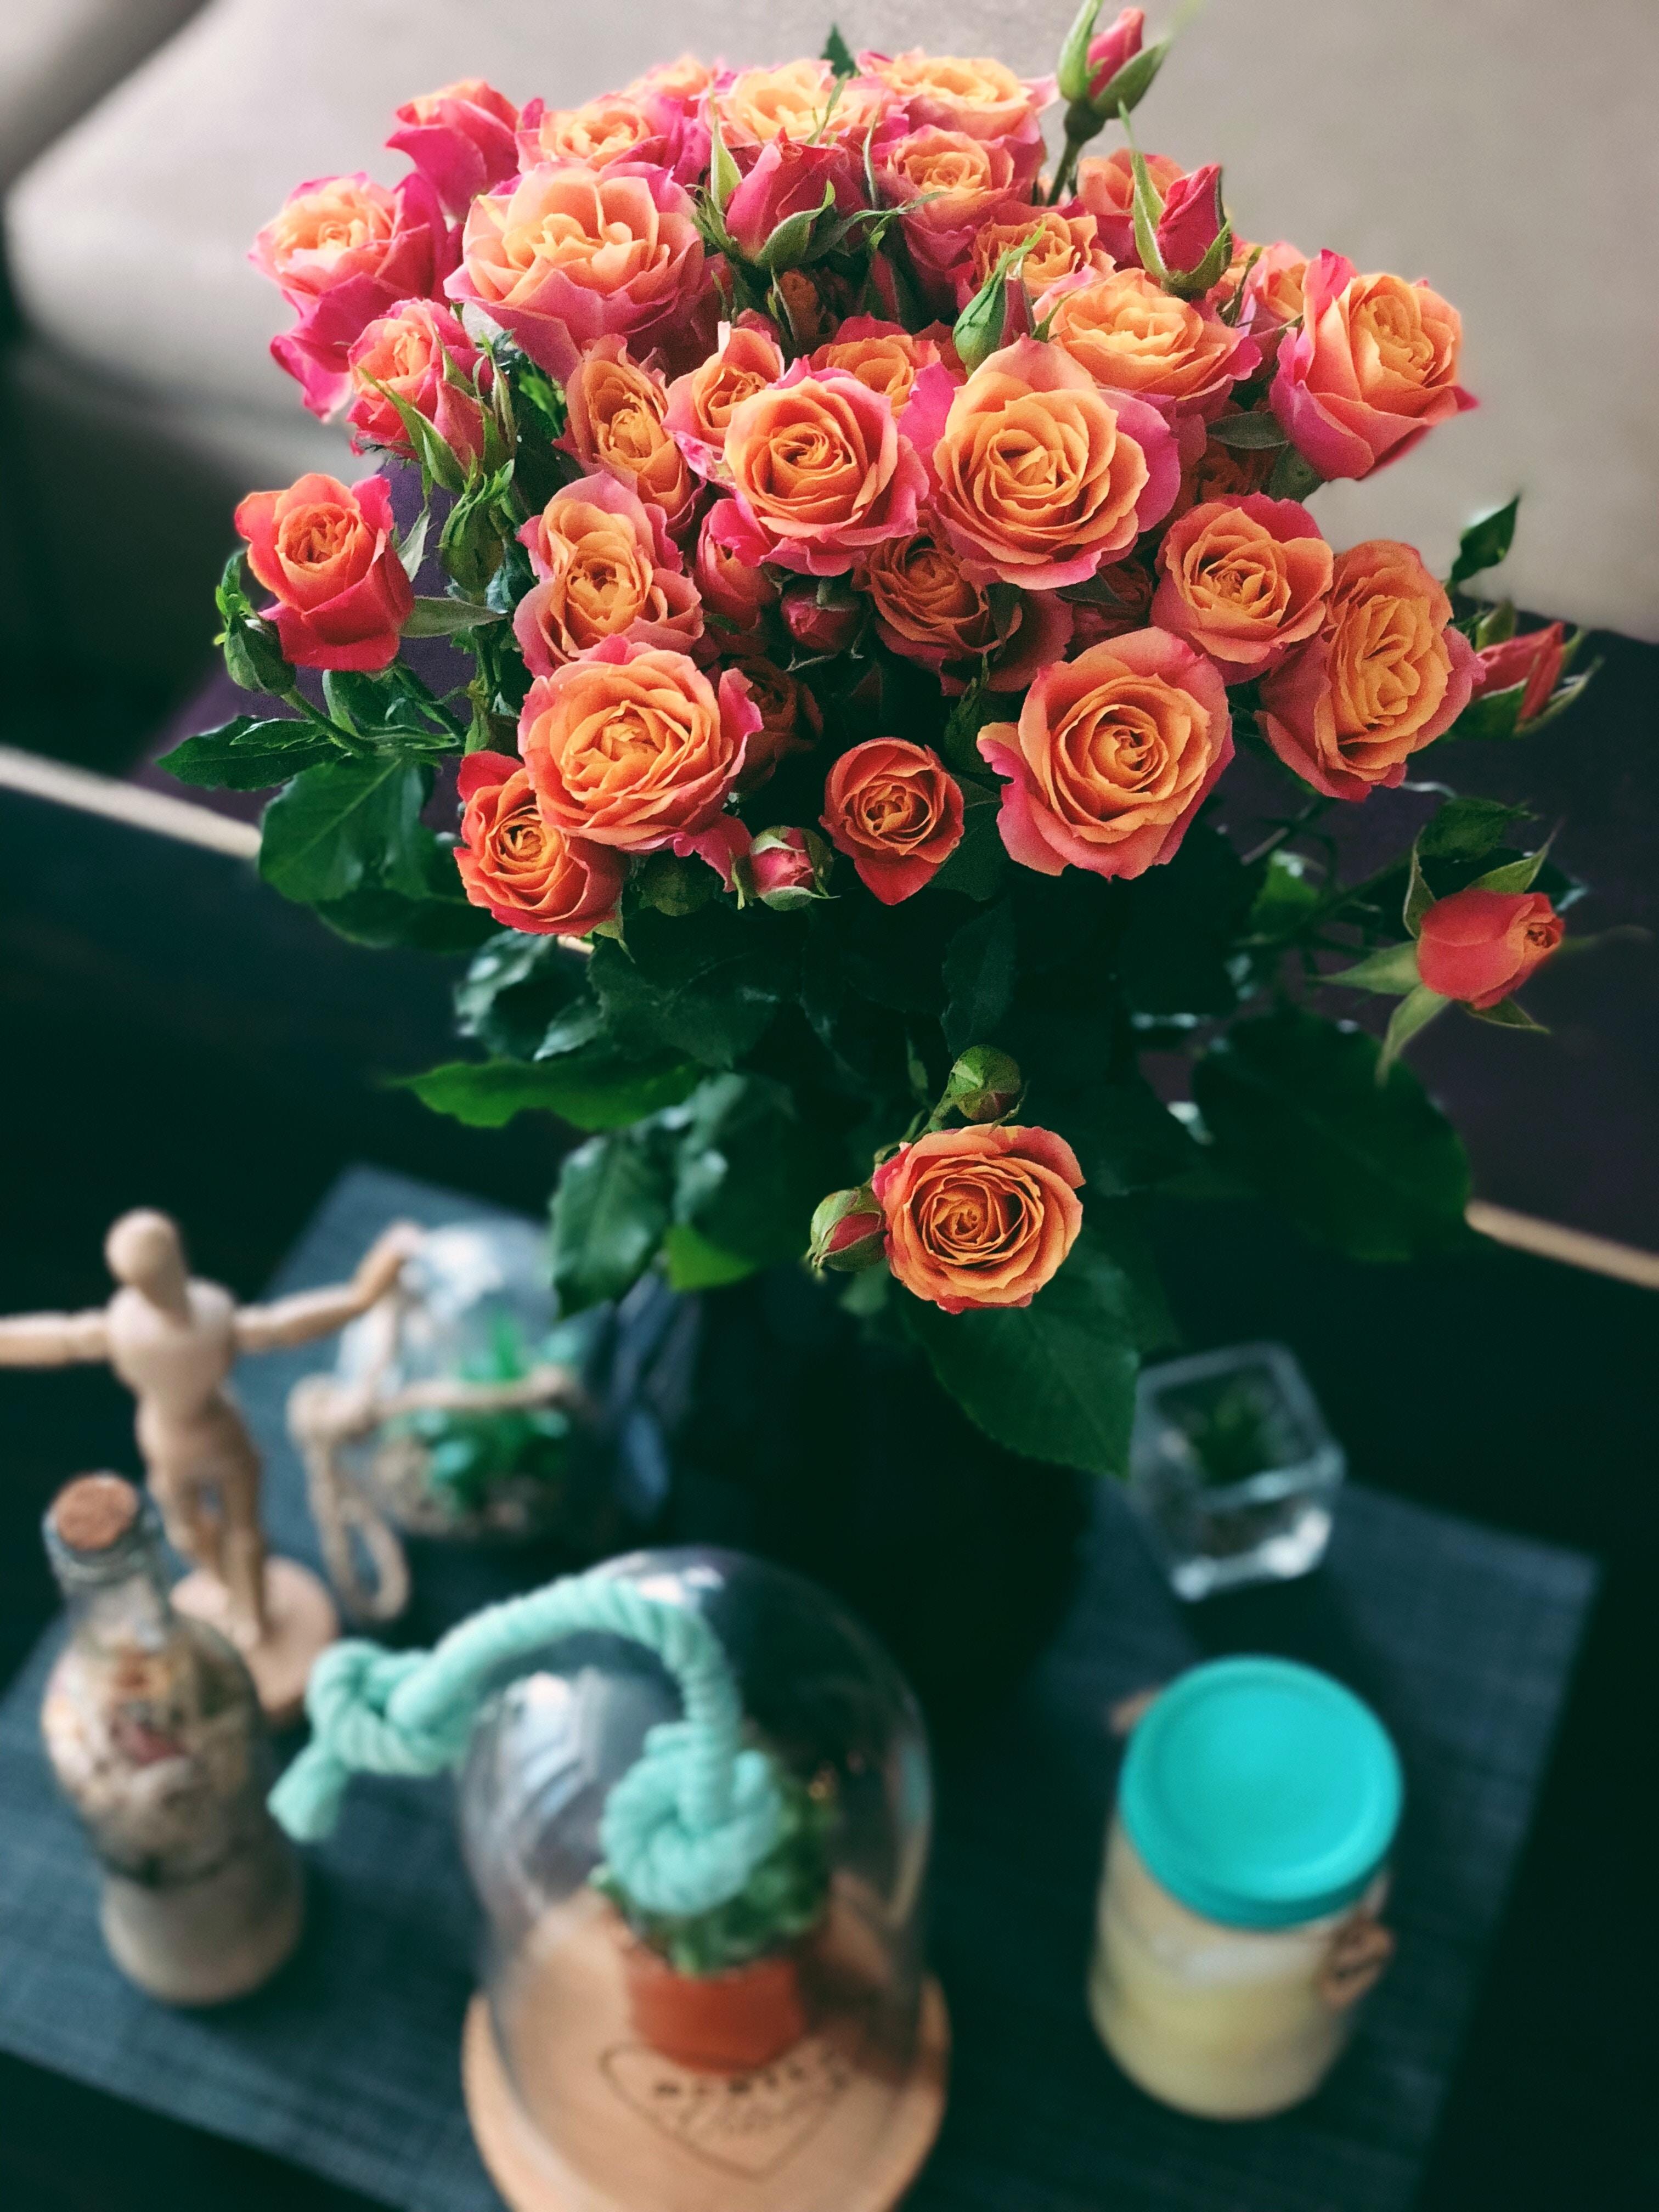 Roses Heal And Illuminate Life